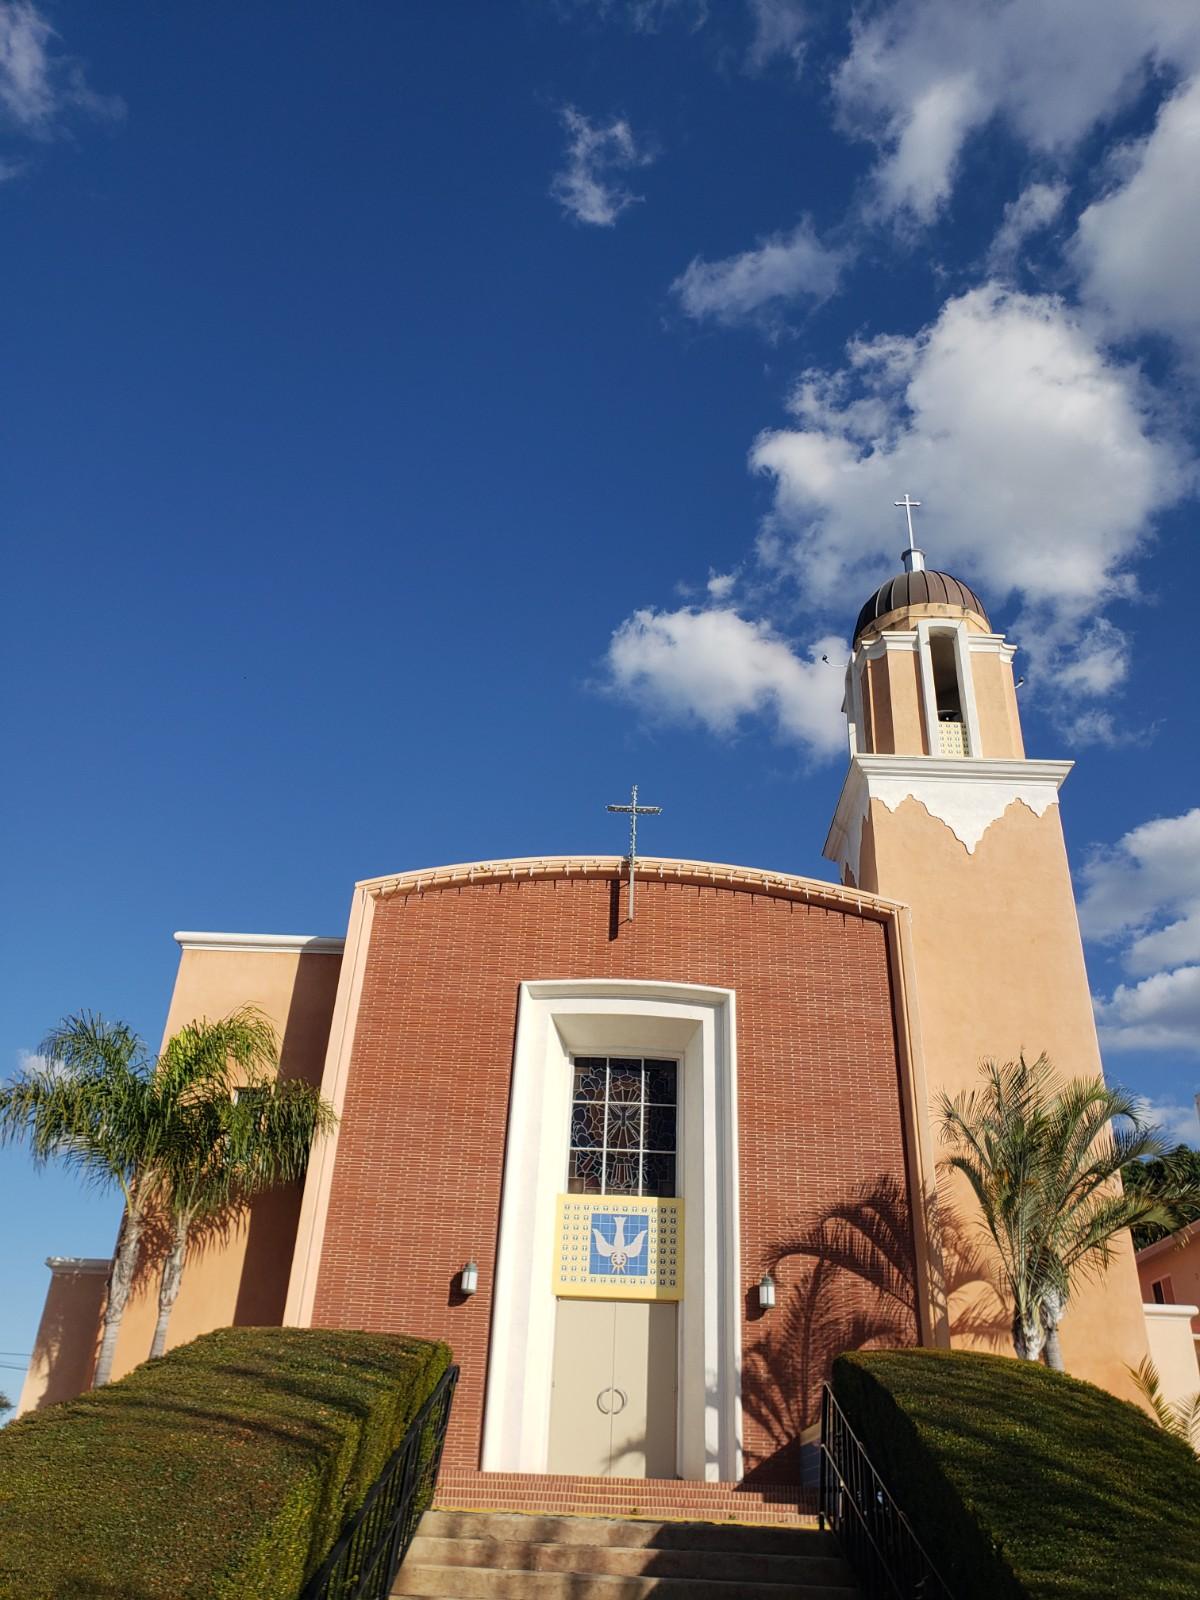 Church/ Architectural